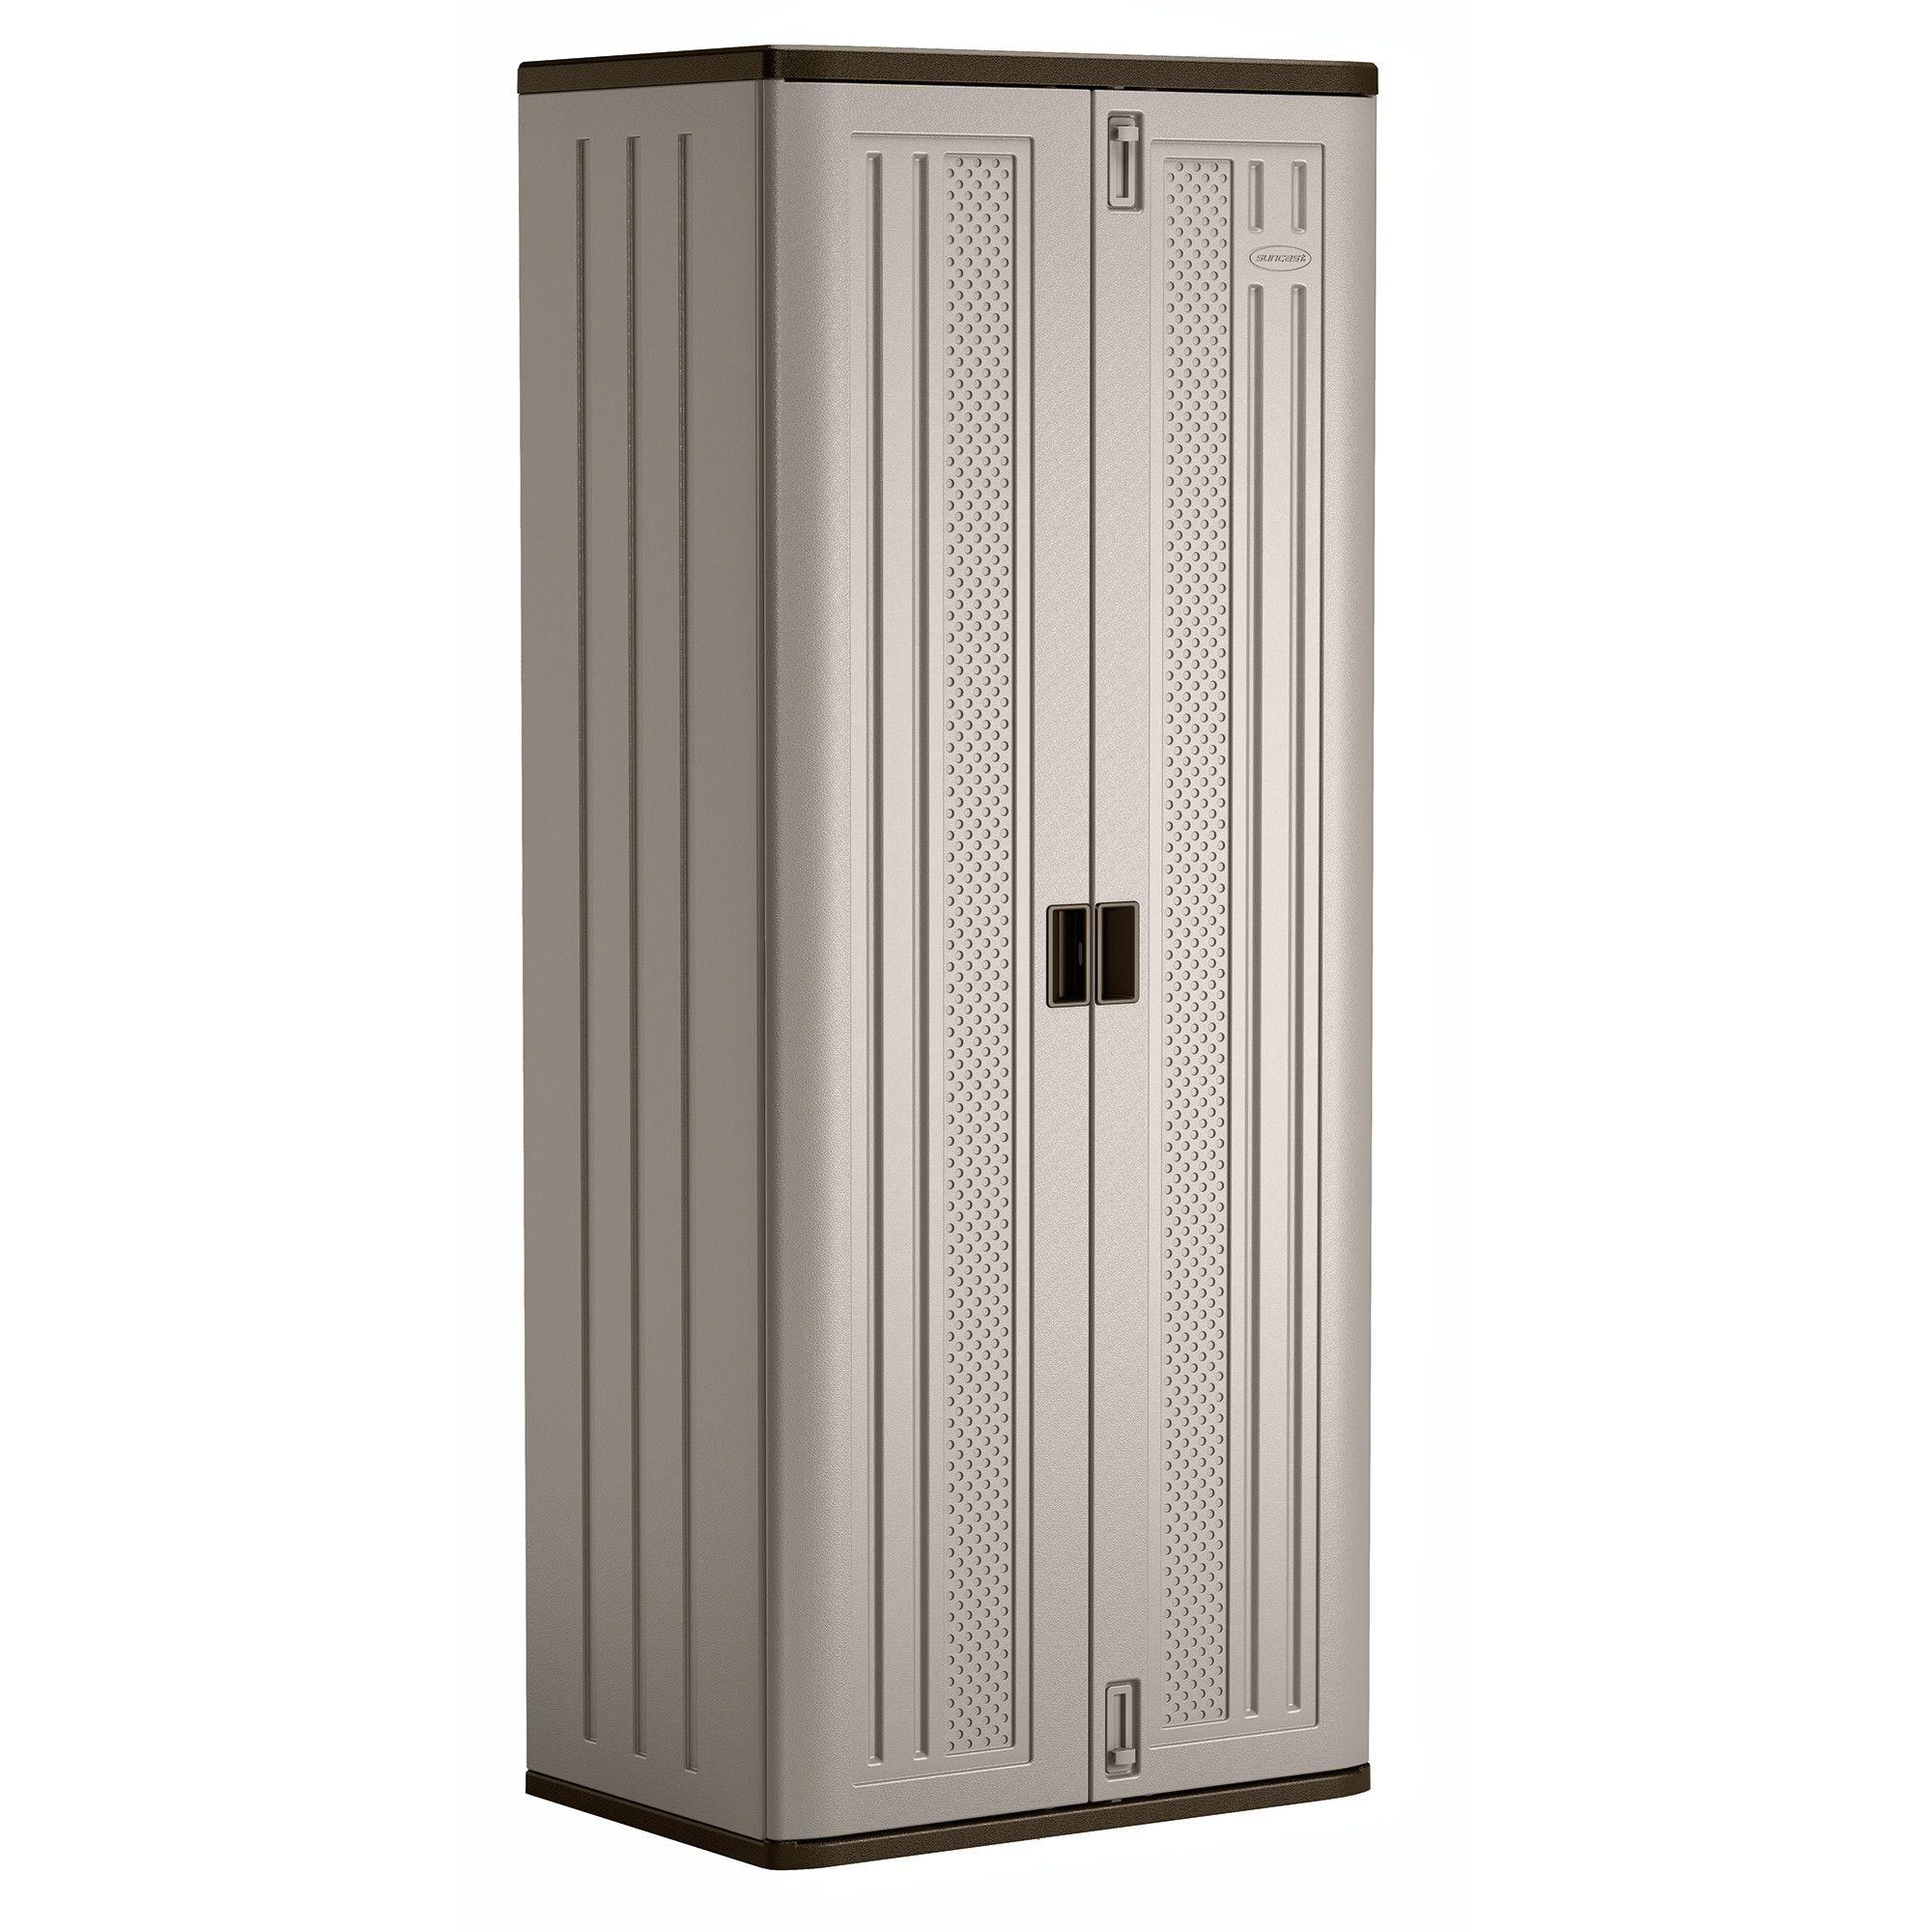 Suncast Resin Base Storage Cabinet Locker 72 H X 30 W For Garage Home Shed Gray Walmart Com In 2020 Locker Storage Storage Outdoor Storage Locker